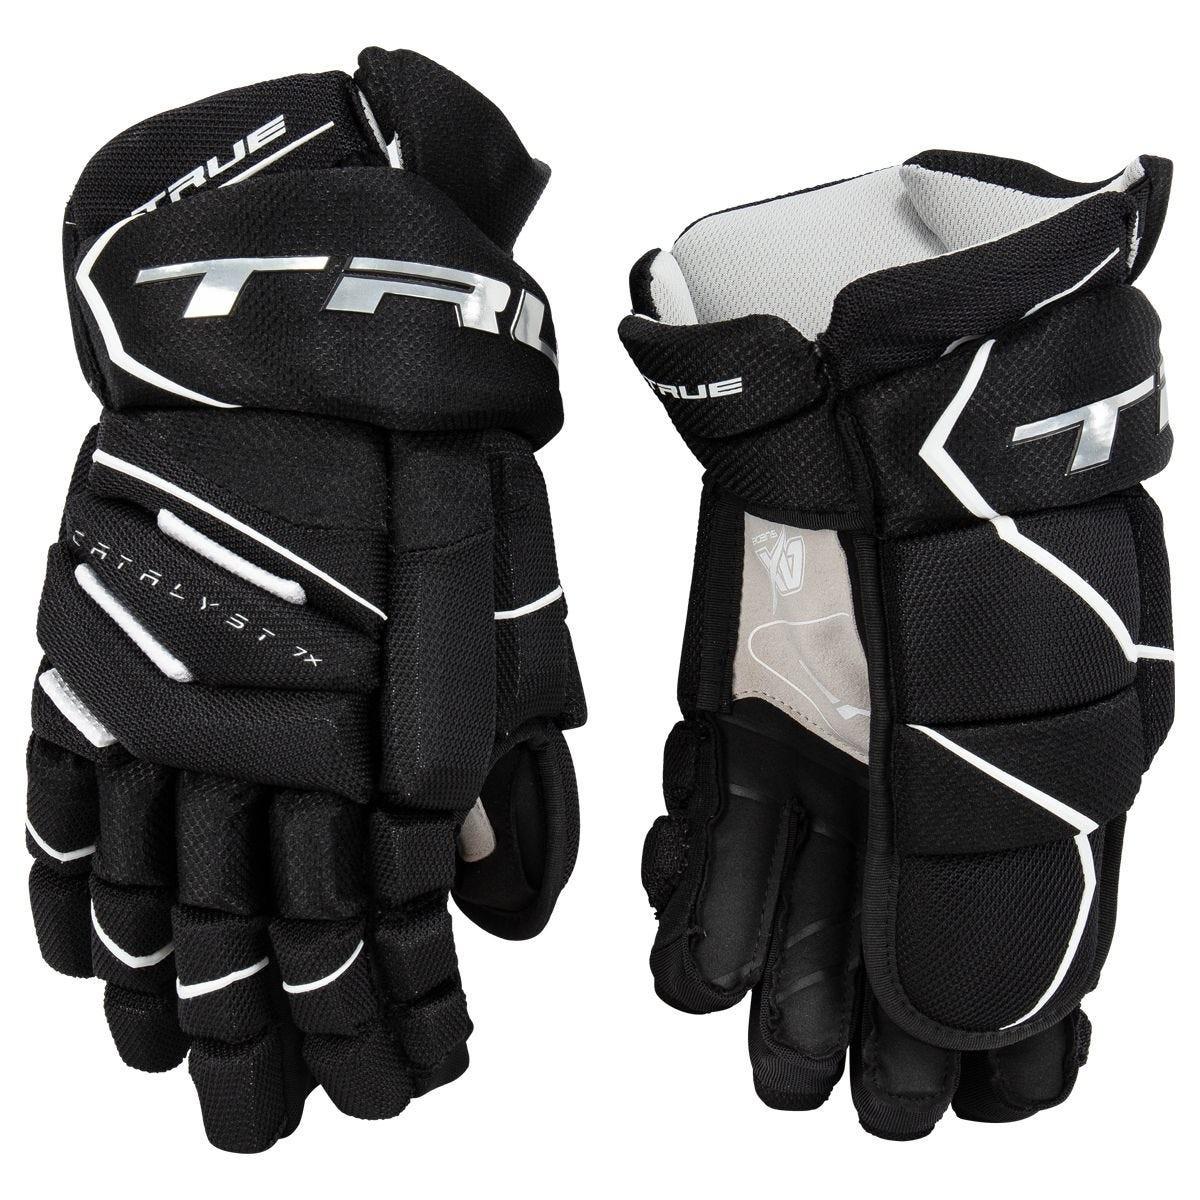 TRUE Catalyst 7X Senior Ice Hockey Gloves